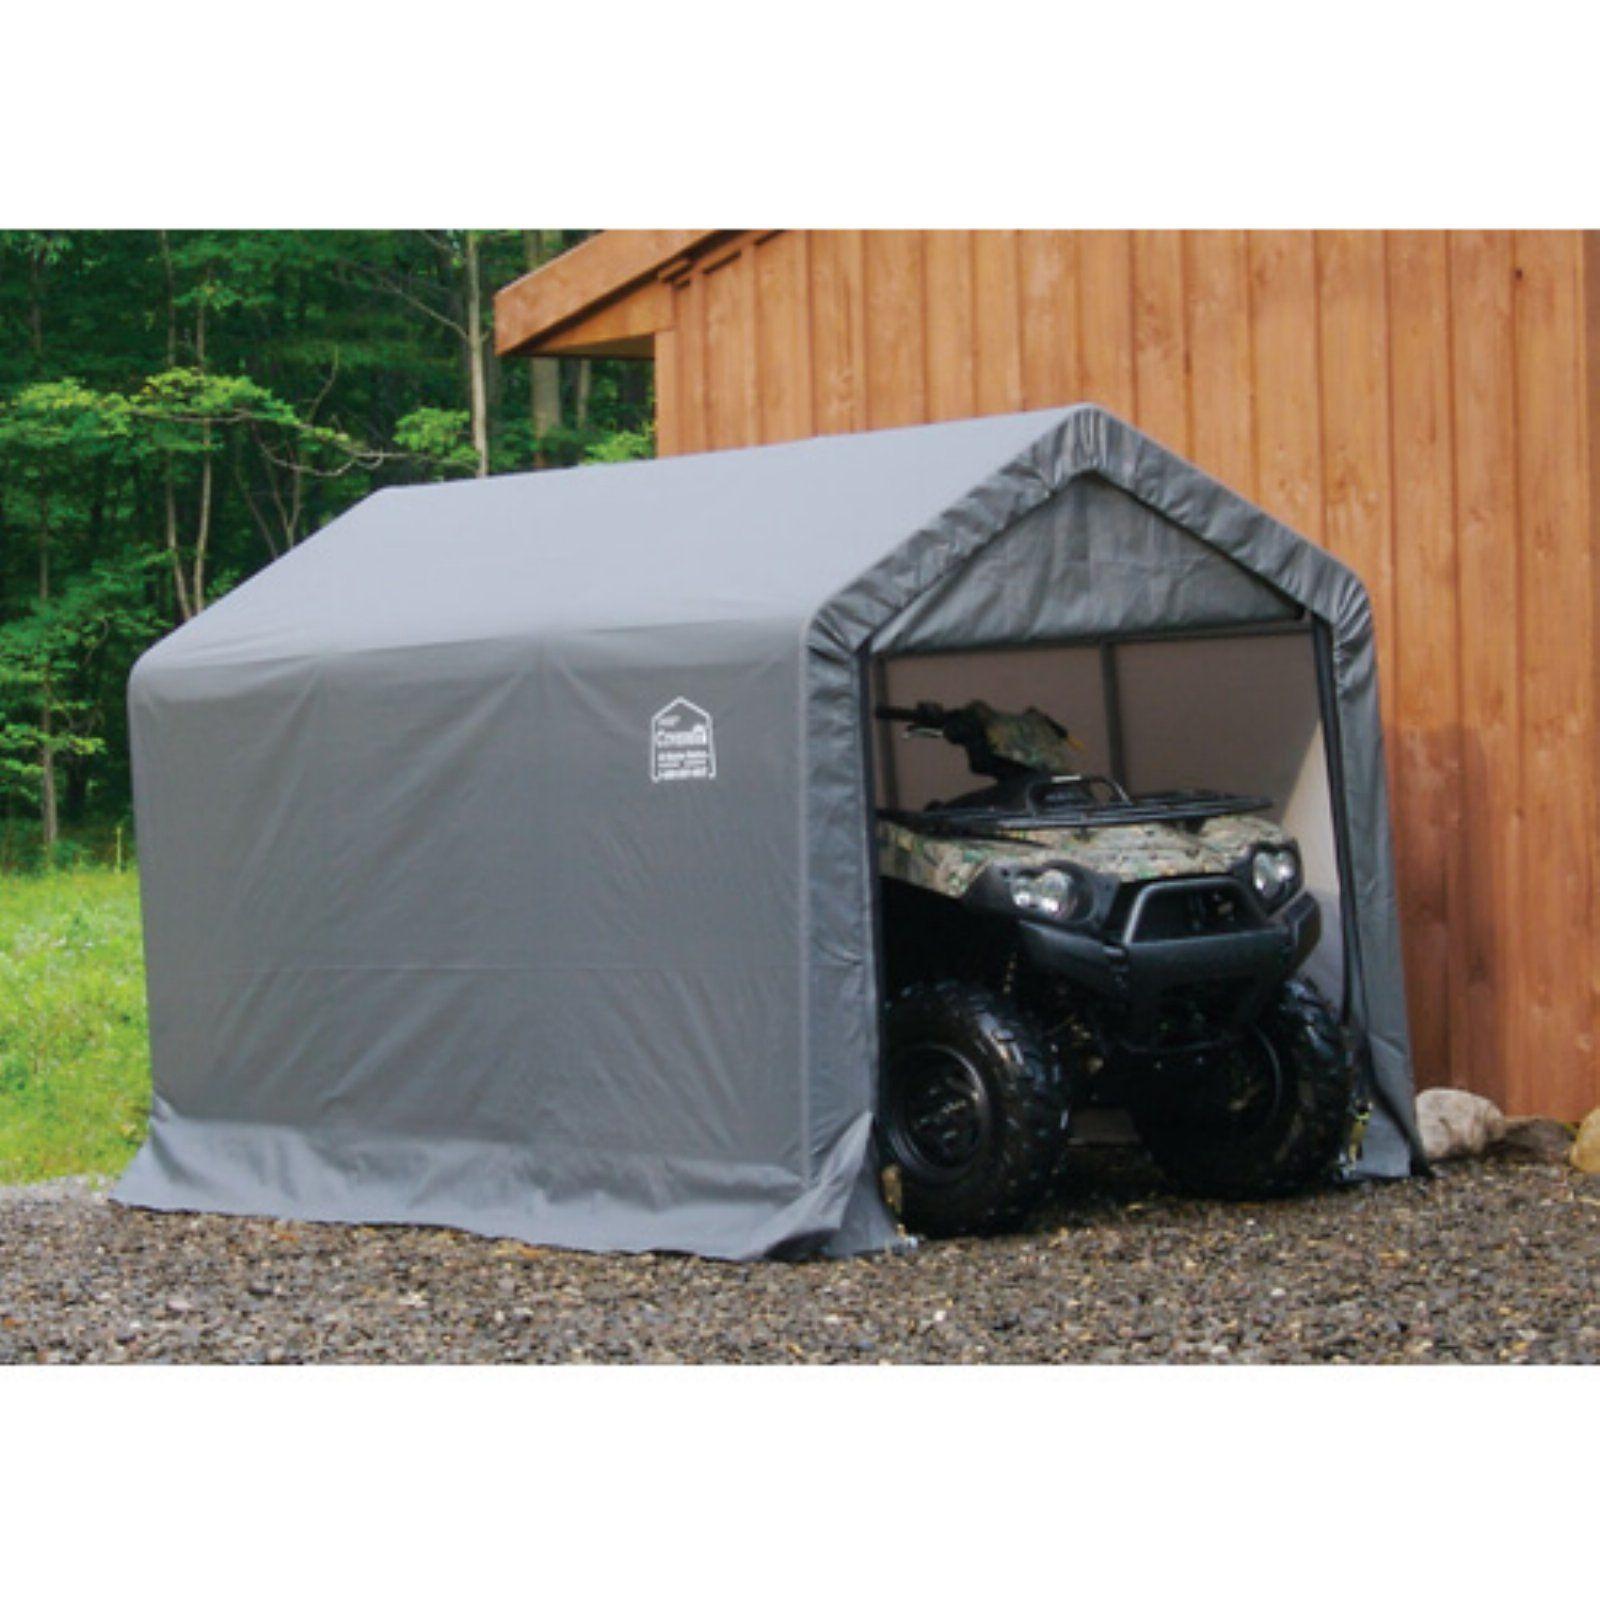 ShelterLogic ShedInABox Canopy Storage Shed 6L x 10W